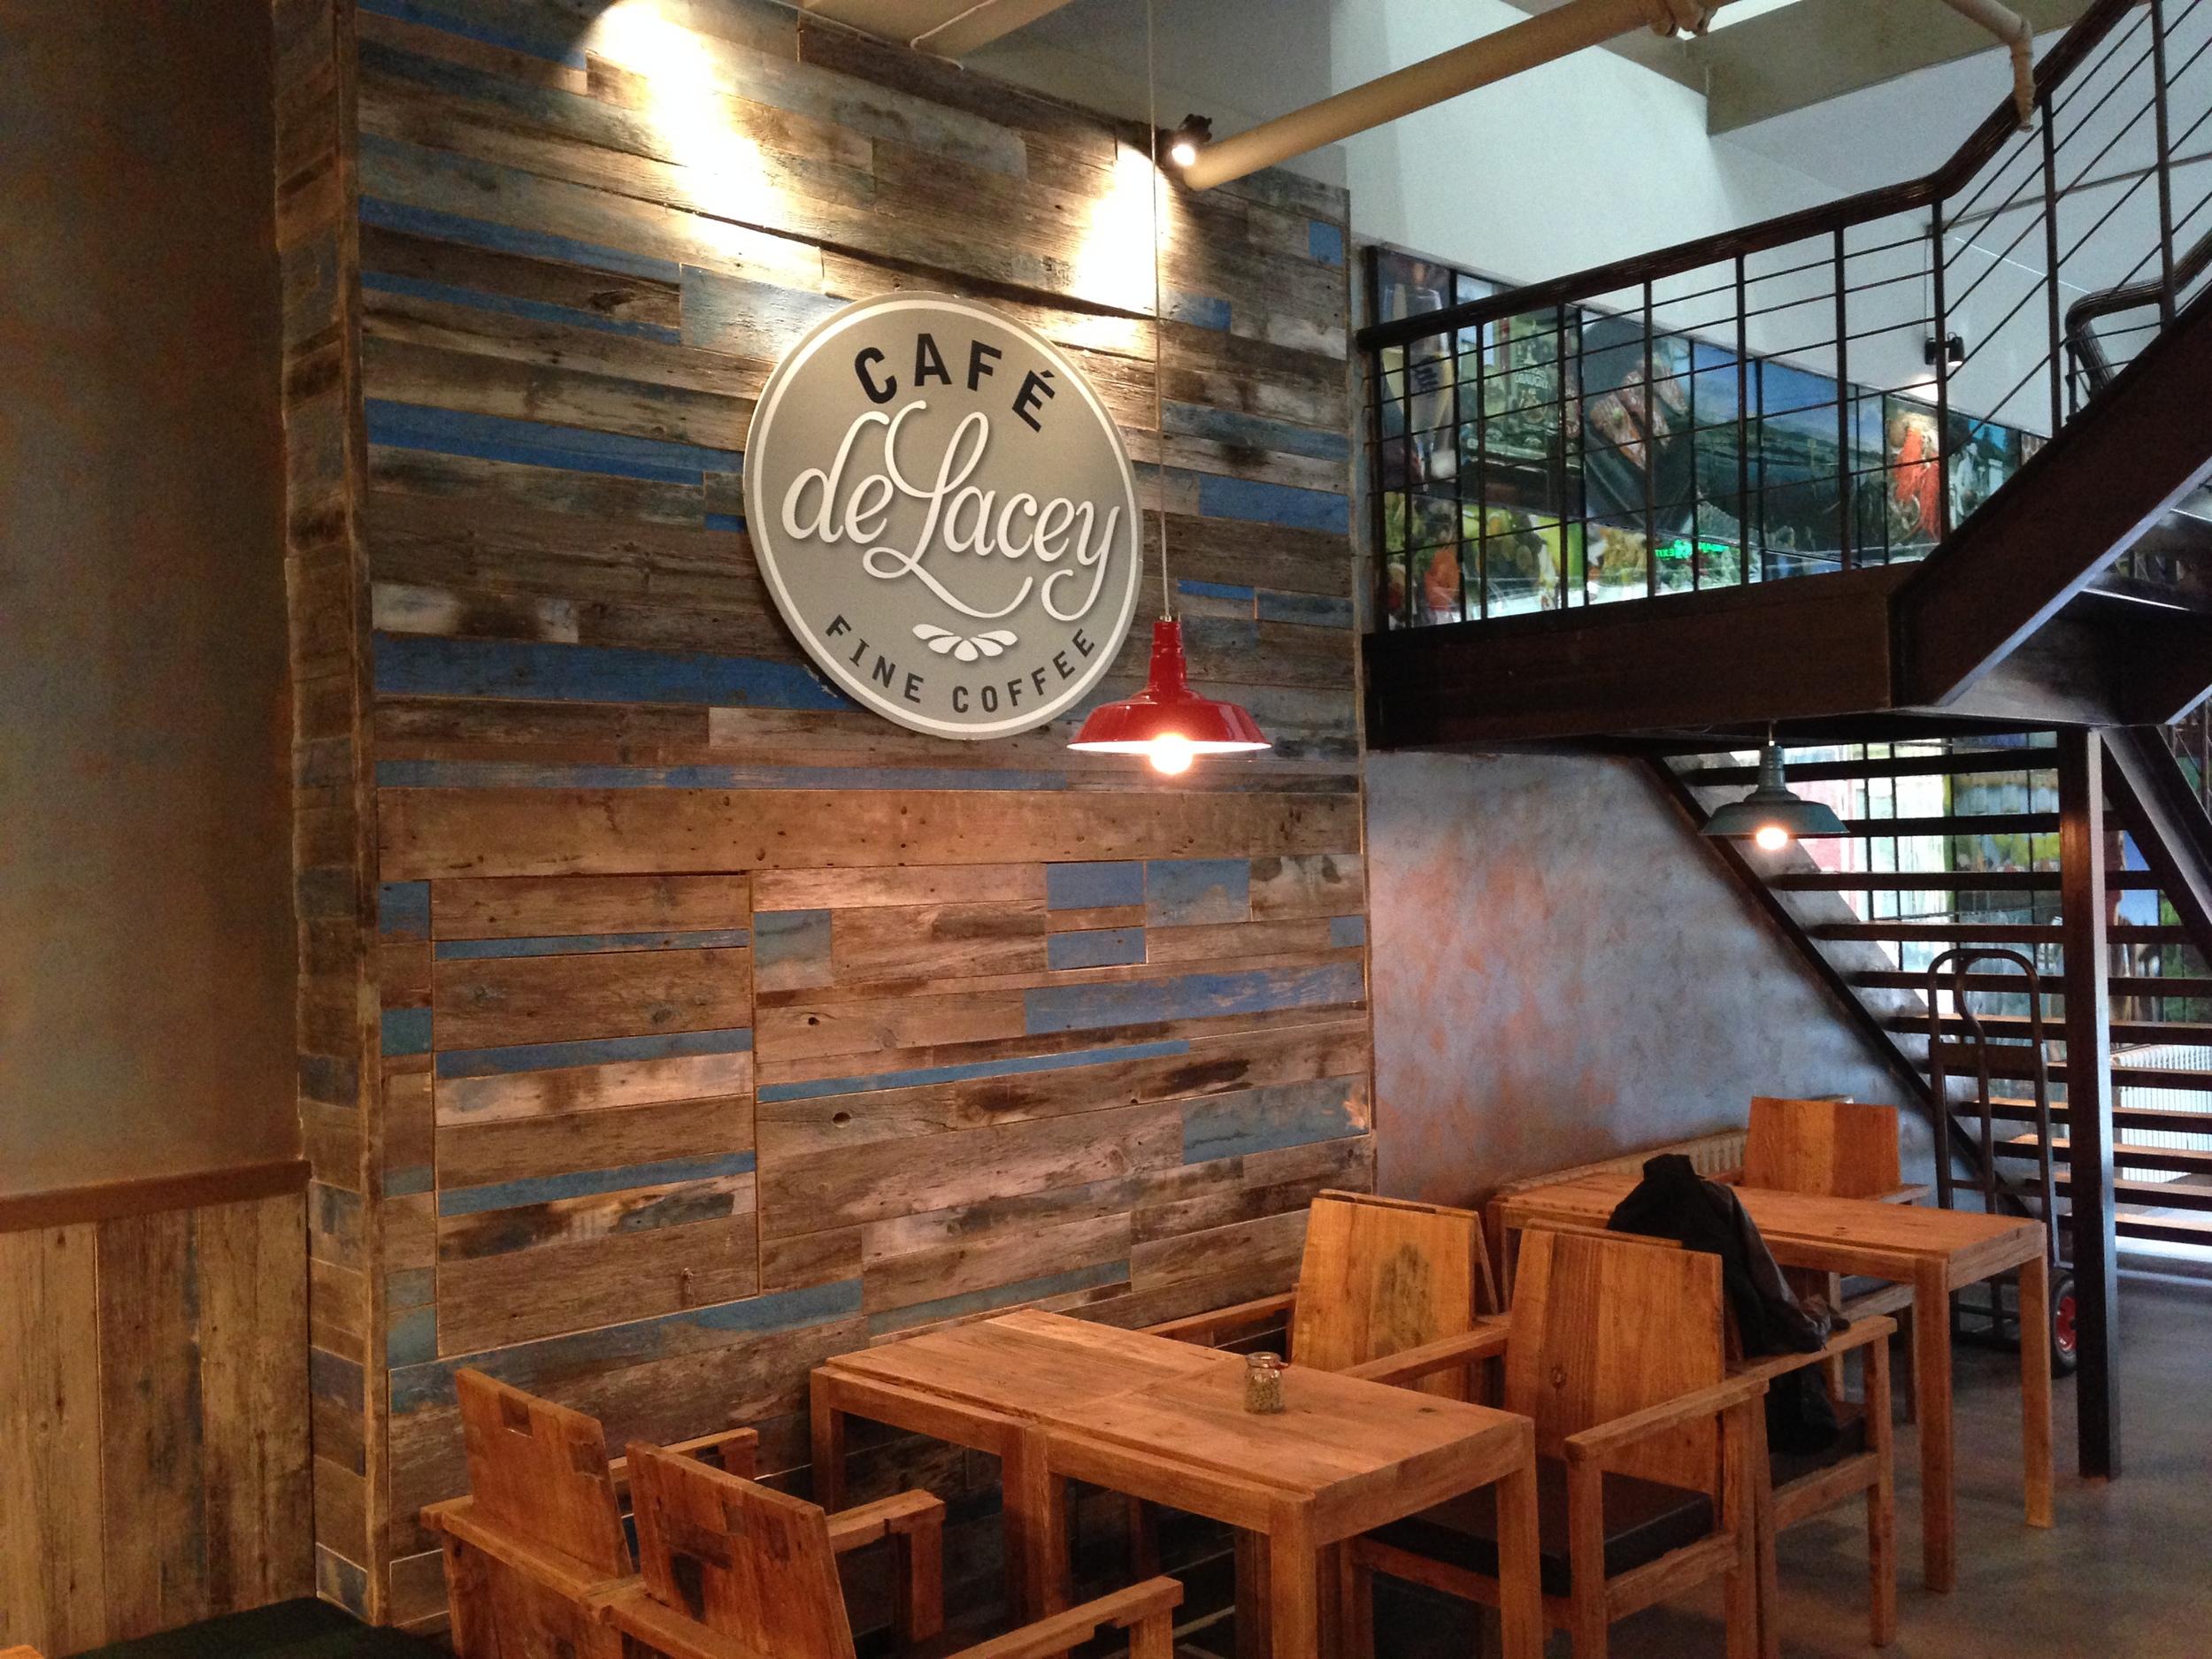 Harbin cafe1.JPG